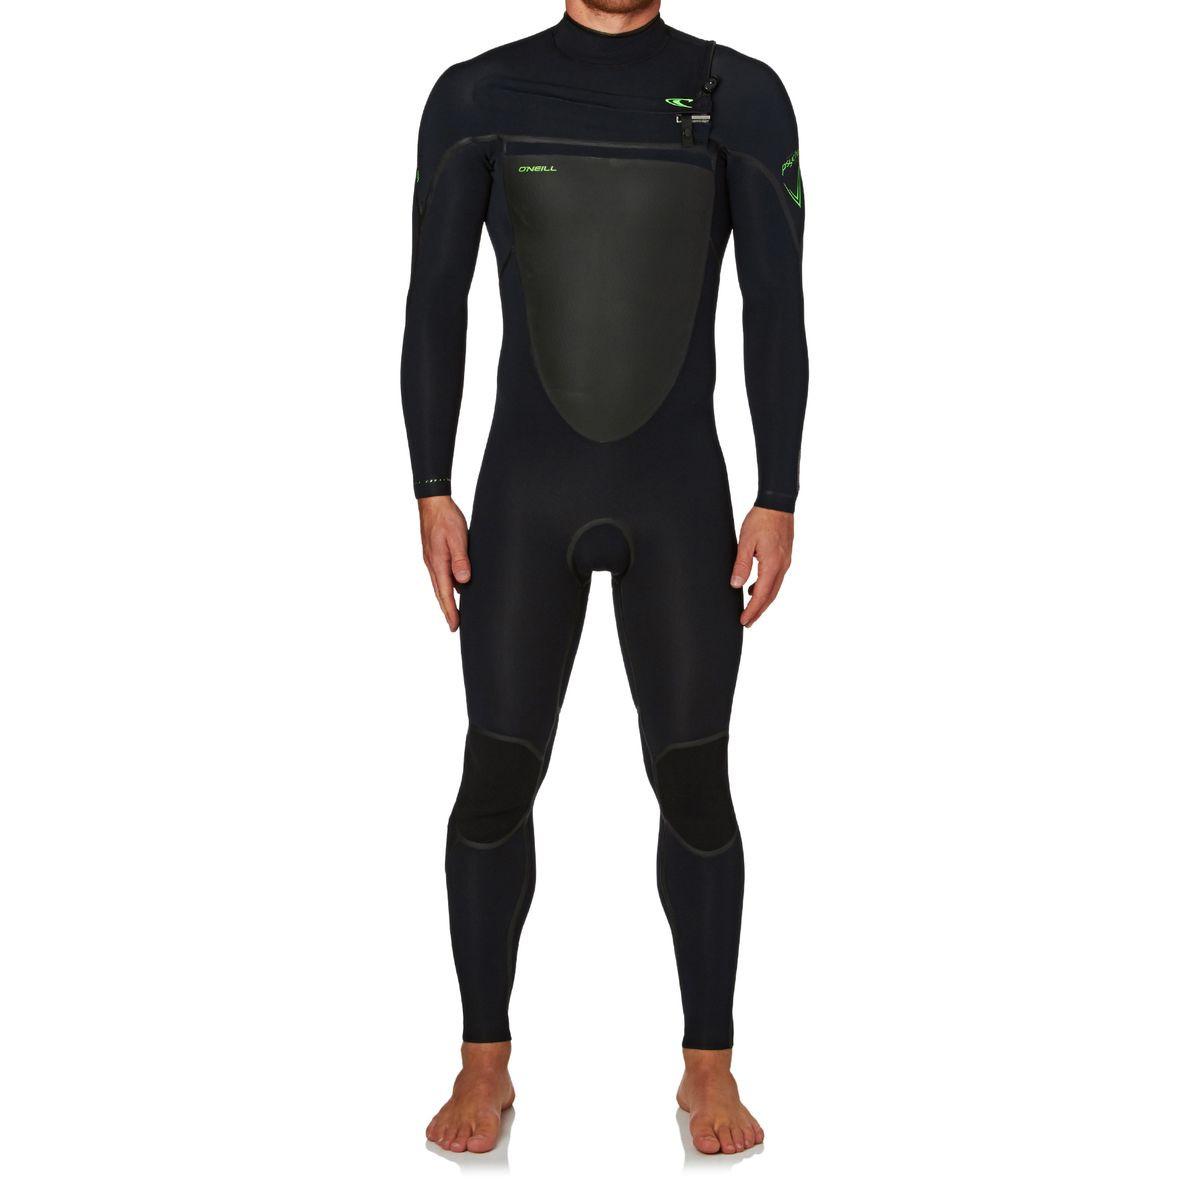 O'Neill Psycho Tech 3/2mm 2017 Chest Zip Wetsuit - Black/ Black/ Dayglow